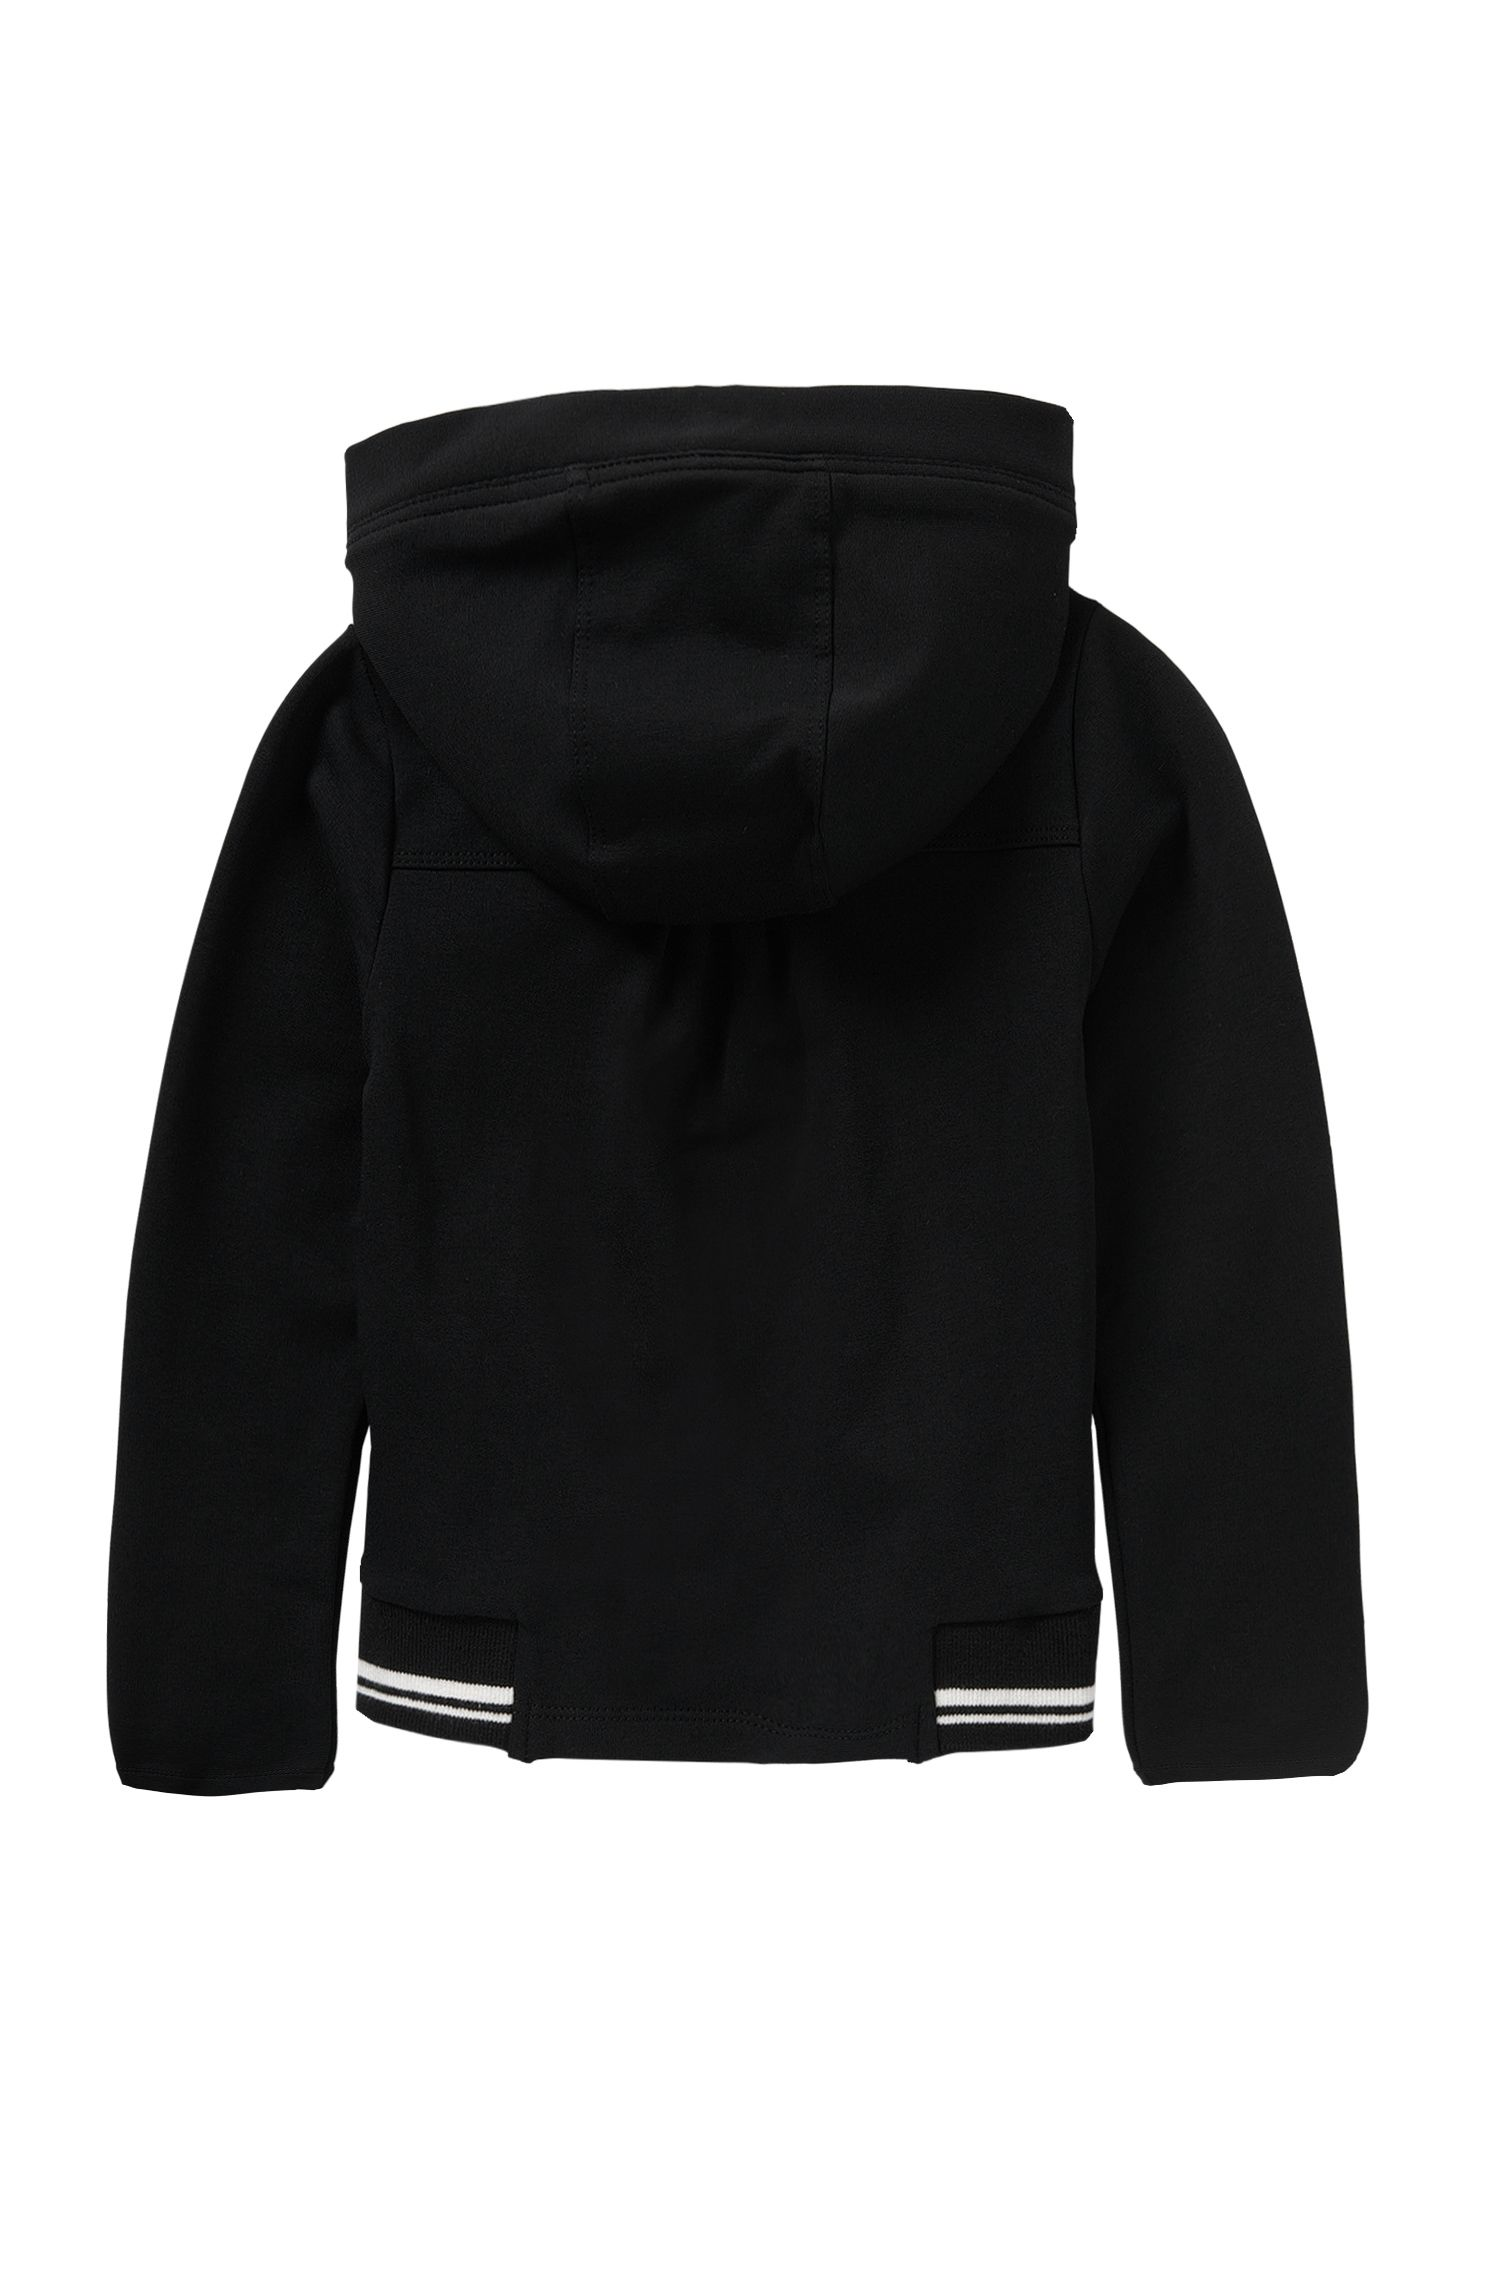 Kids-Sweatshirt-Jacke aus Stretch-Baumwolle: 'J15347'